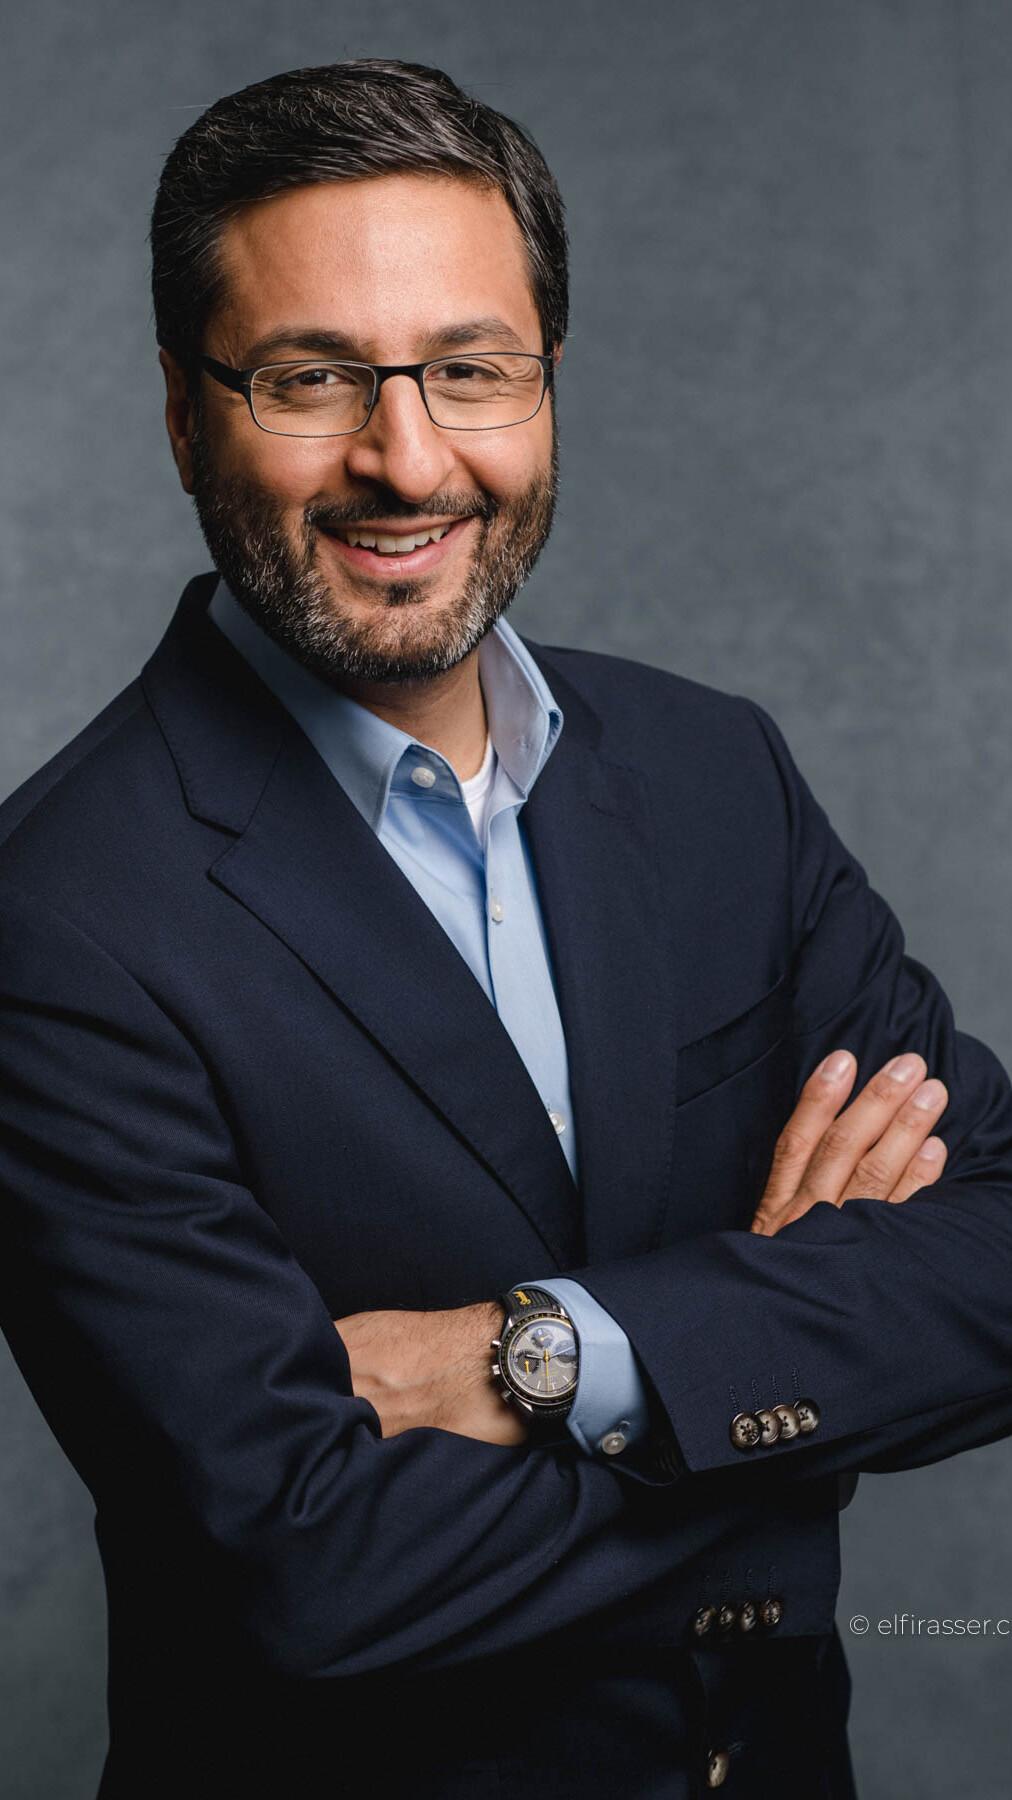 Personal Branding Business Portraits